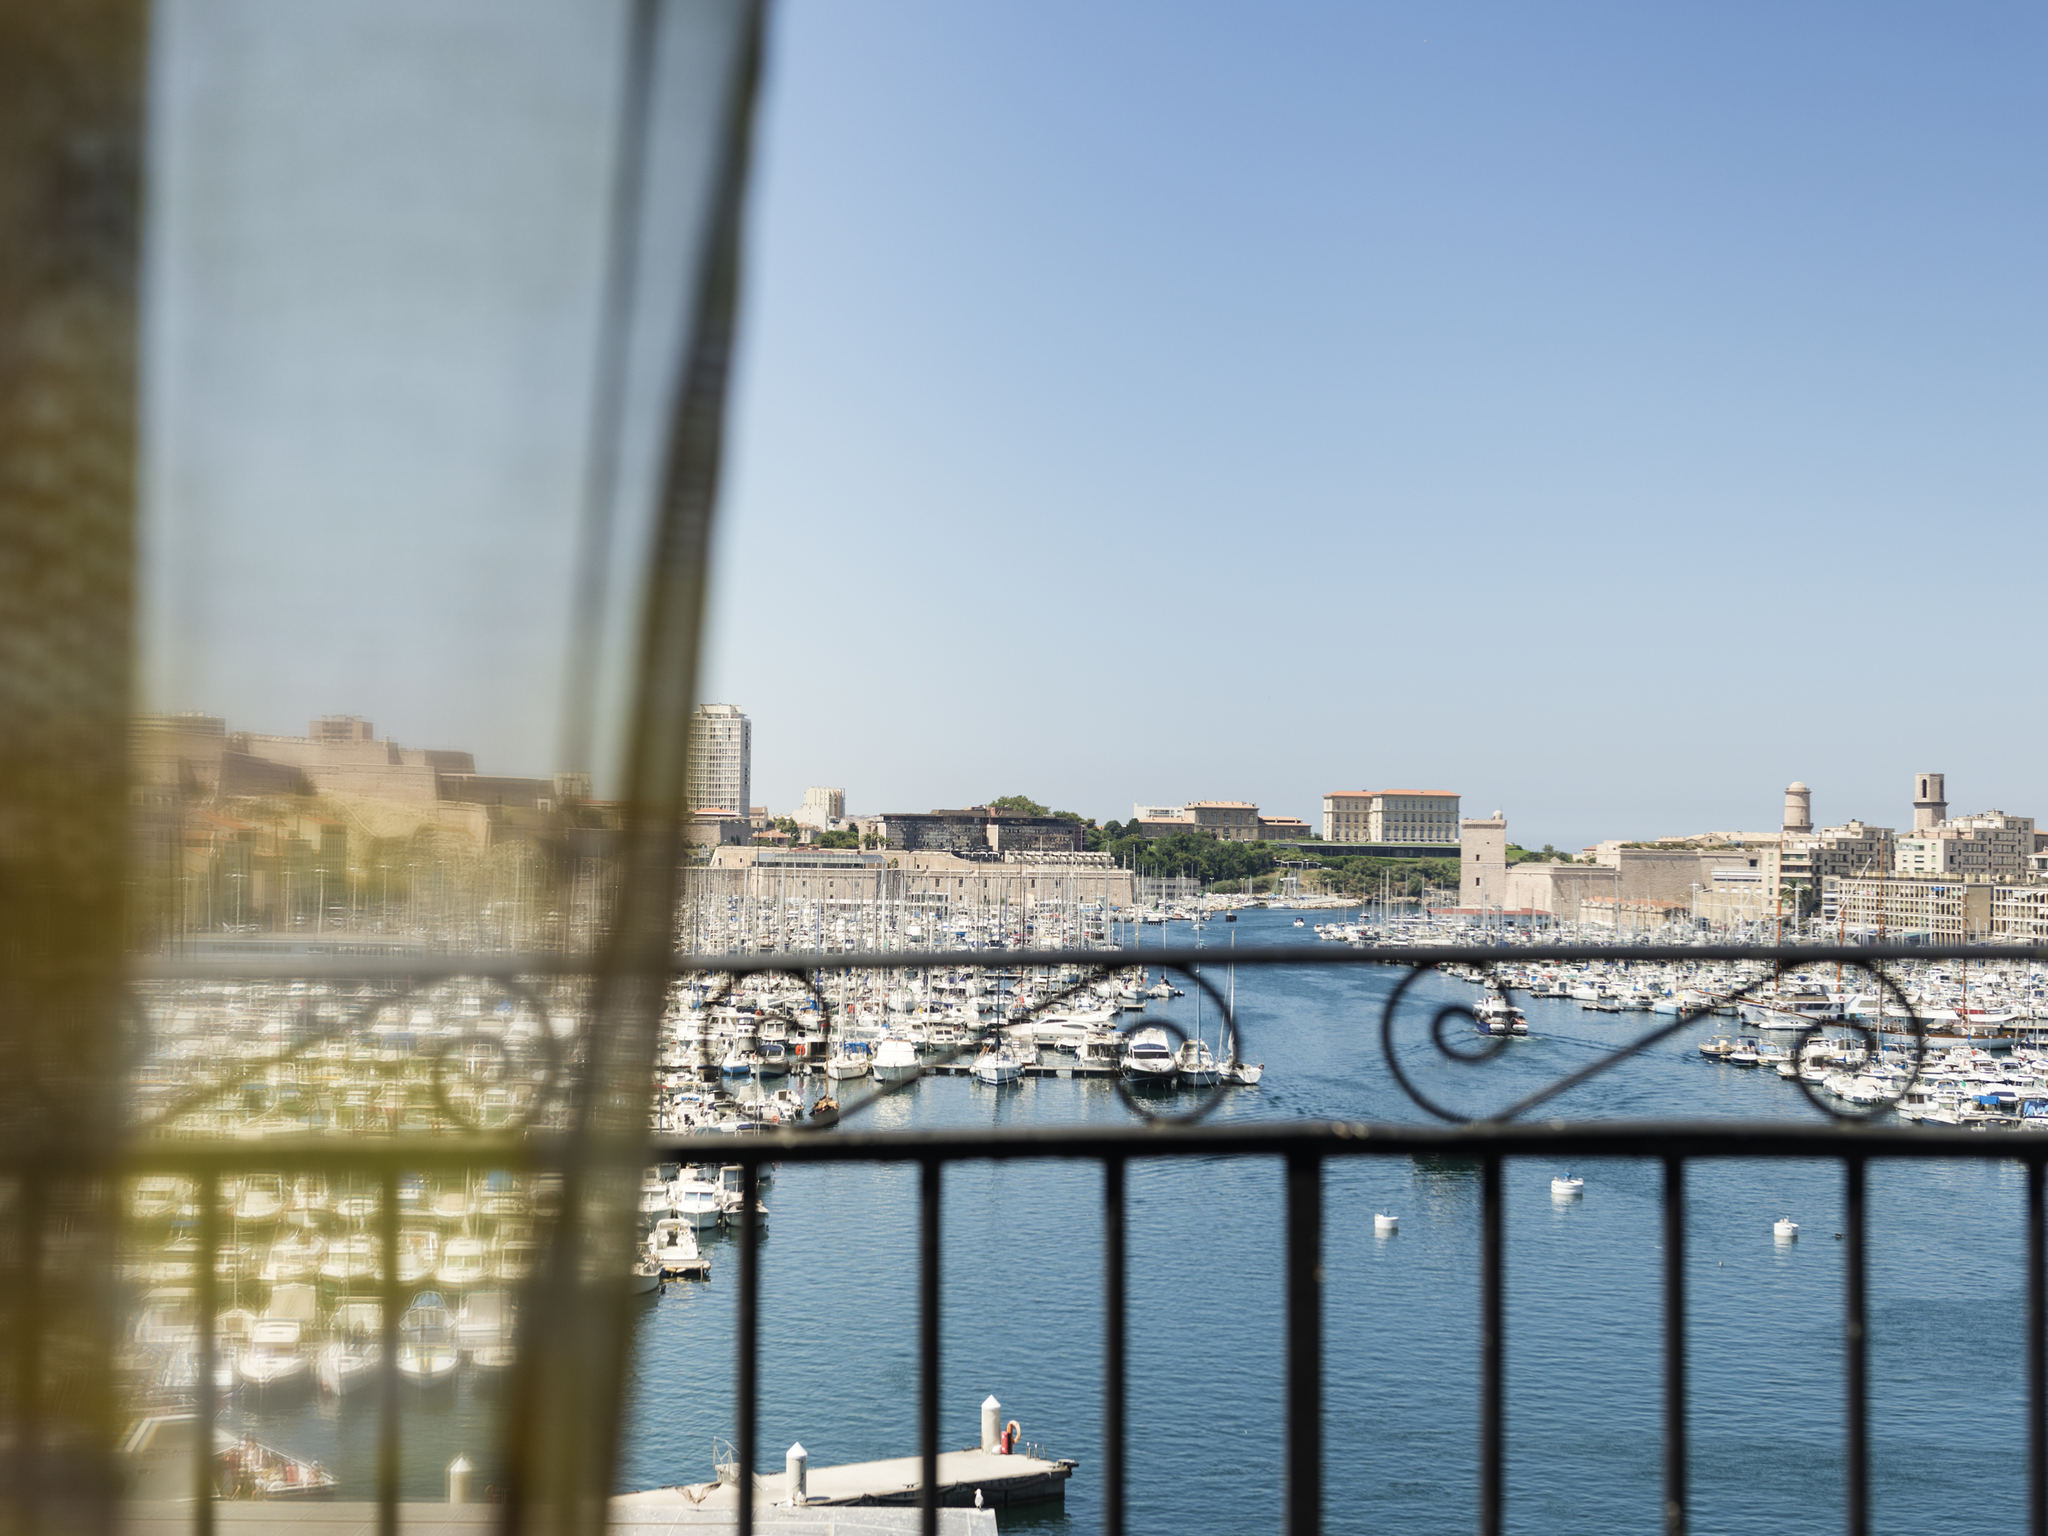 Hotel In MARSEILLES Grand Hôtel Beauvau Marseille VieuxPort - Hotel marseille vieux port pas cher